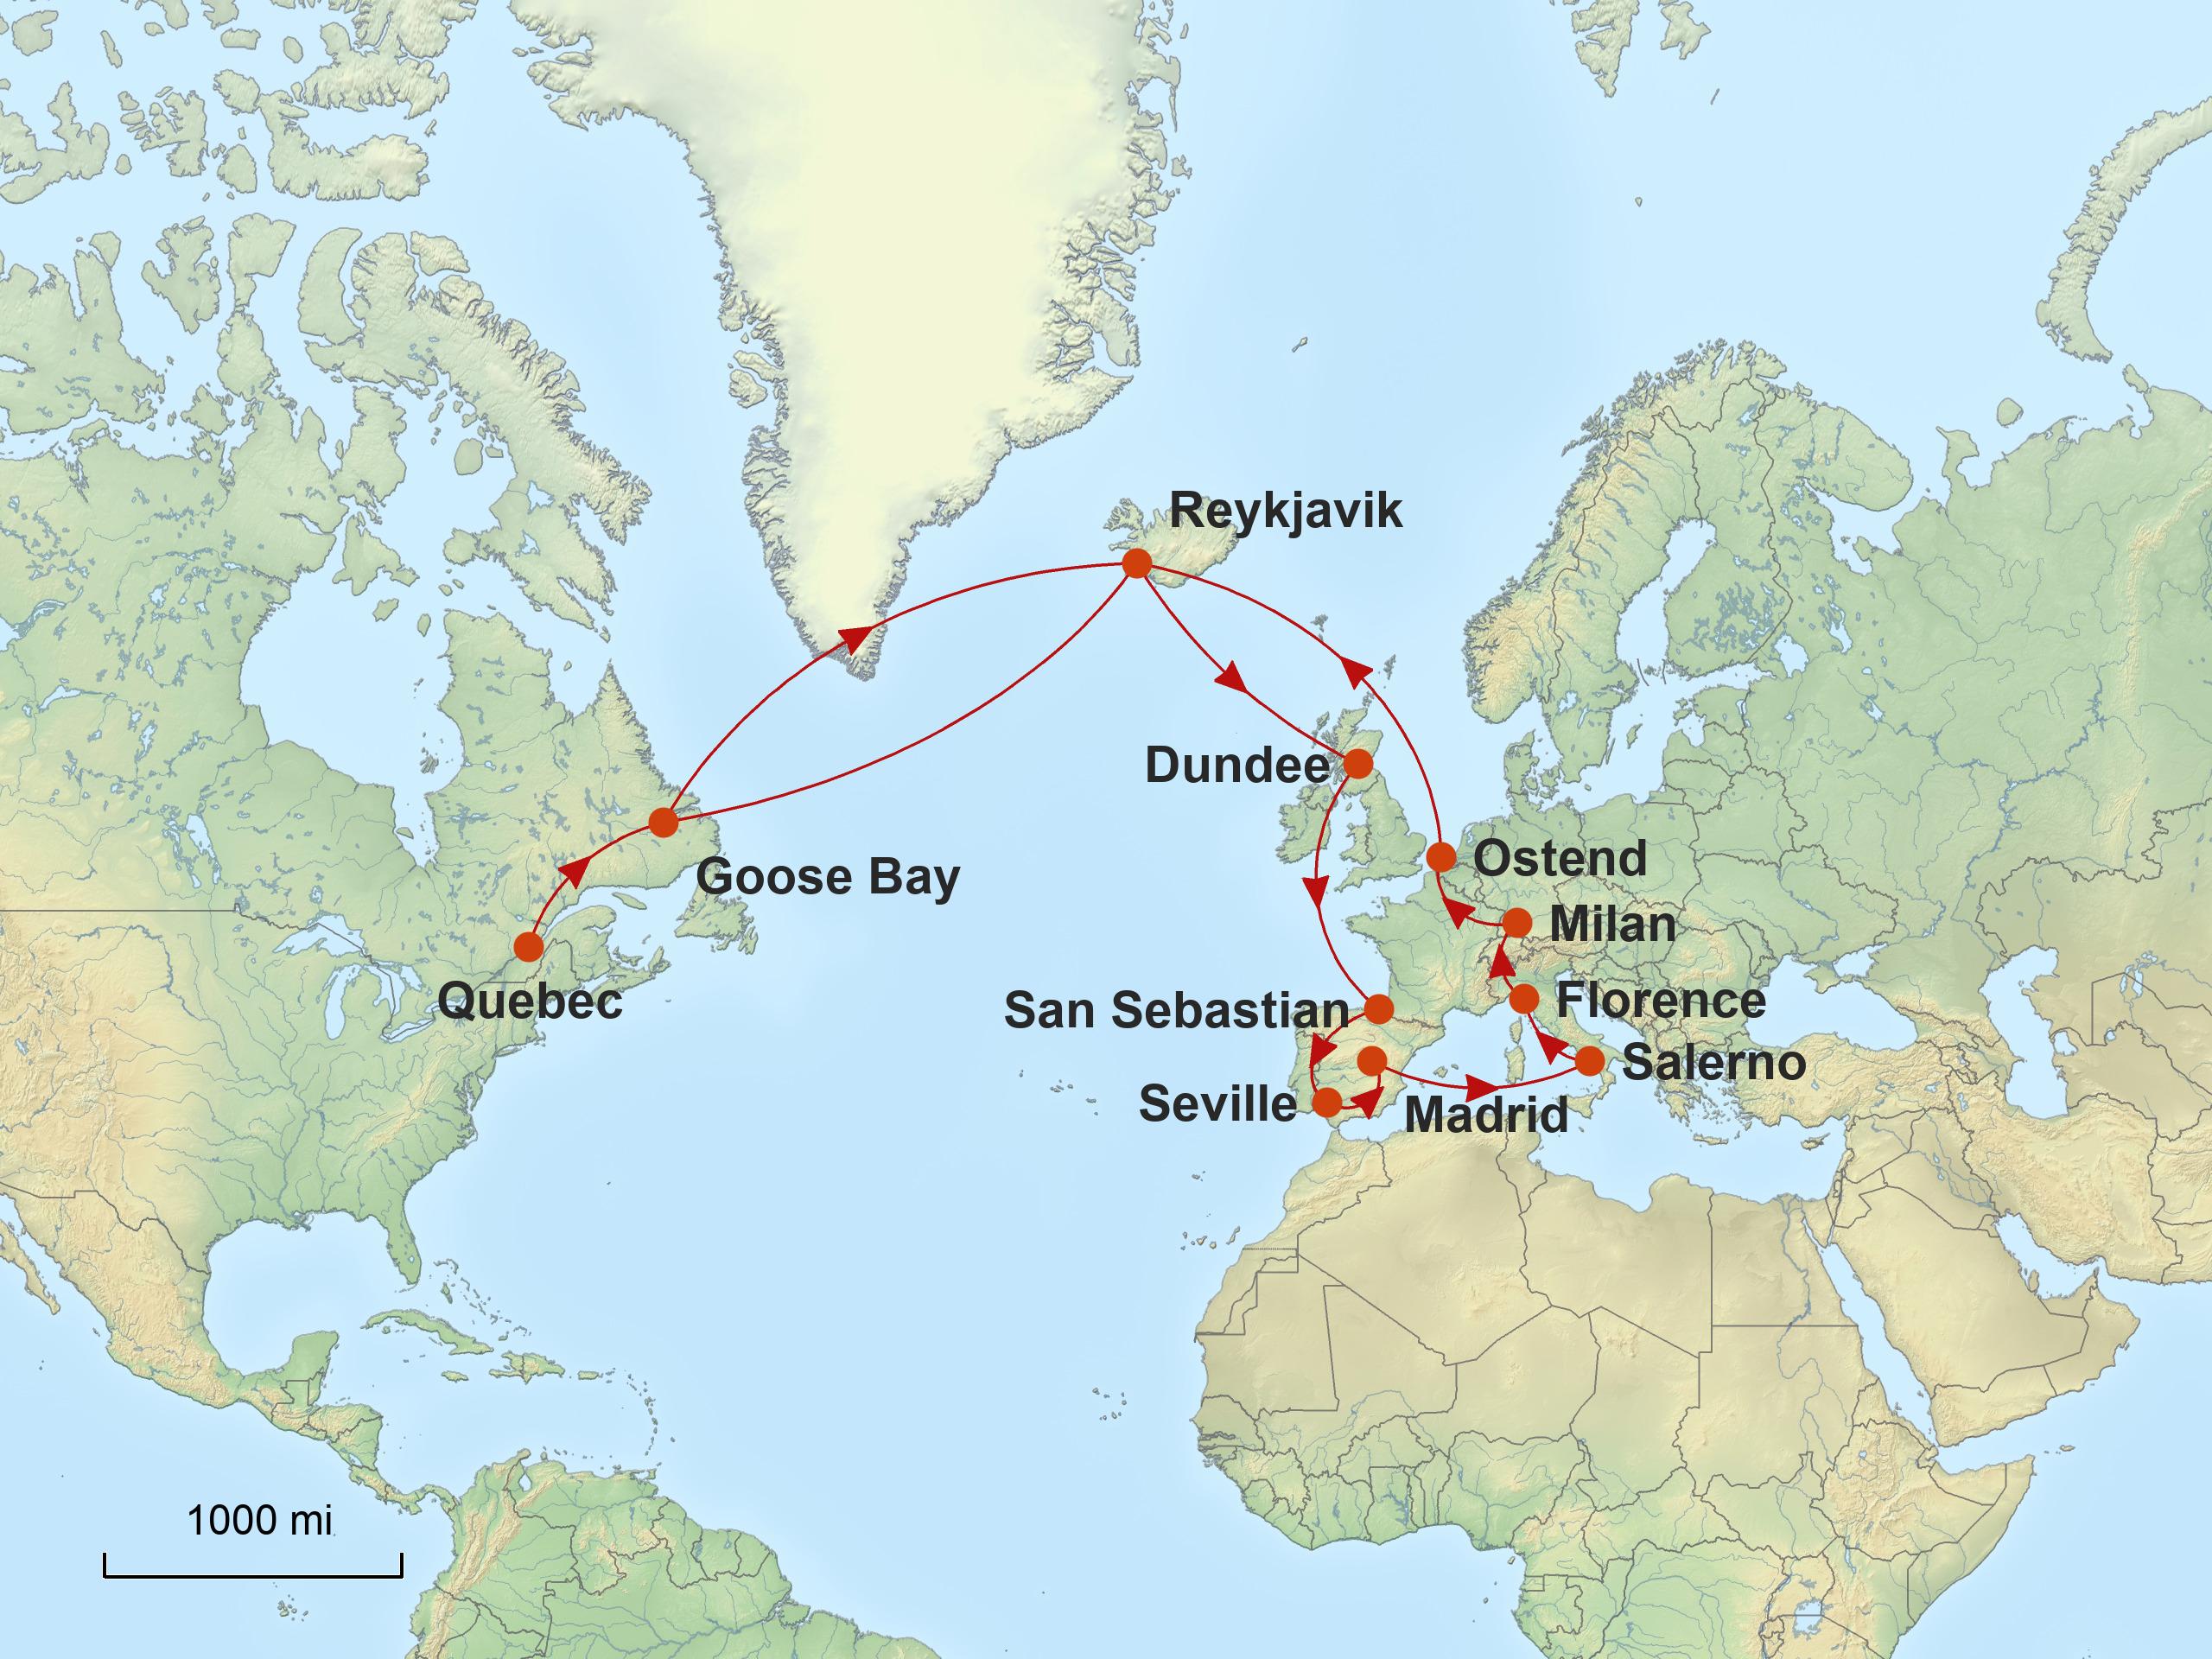 Stepmap Karte Europe May 2018 V3 Jpg Air Journey